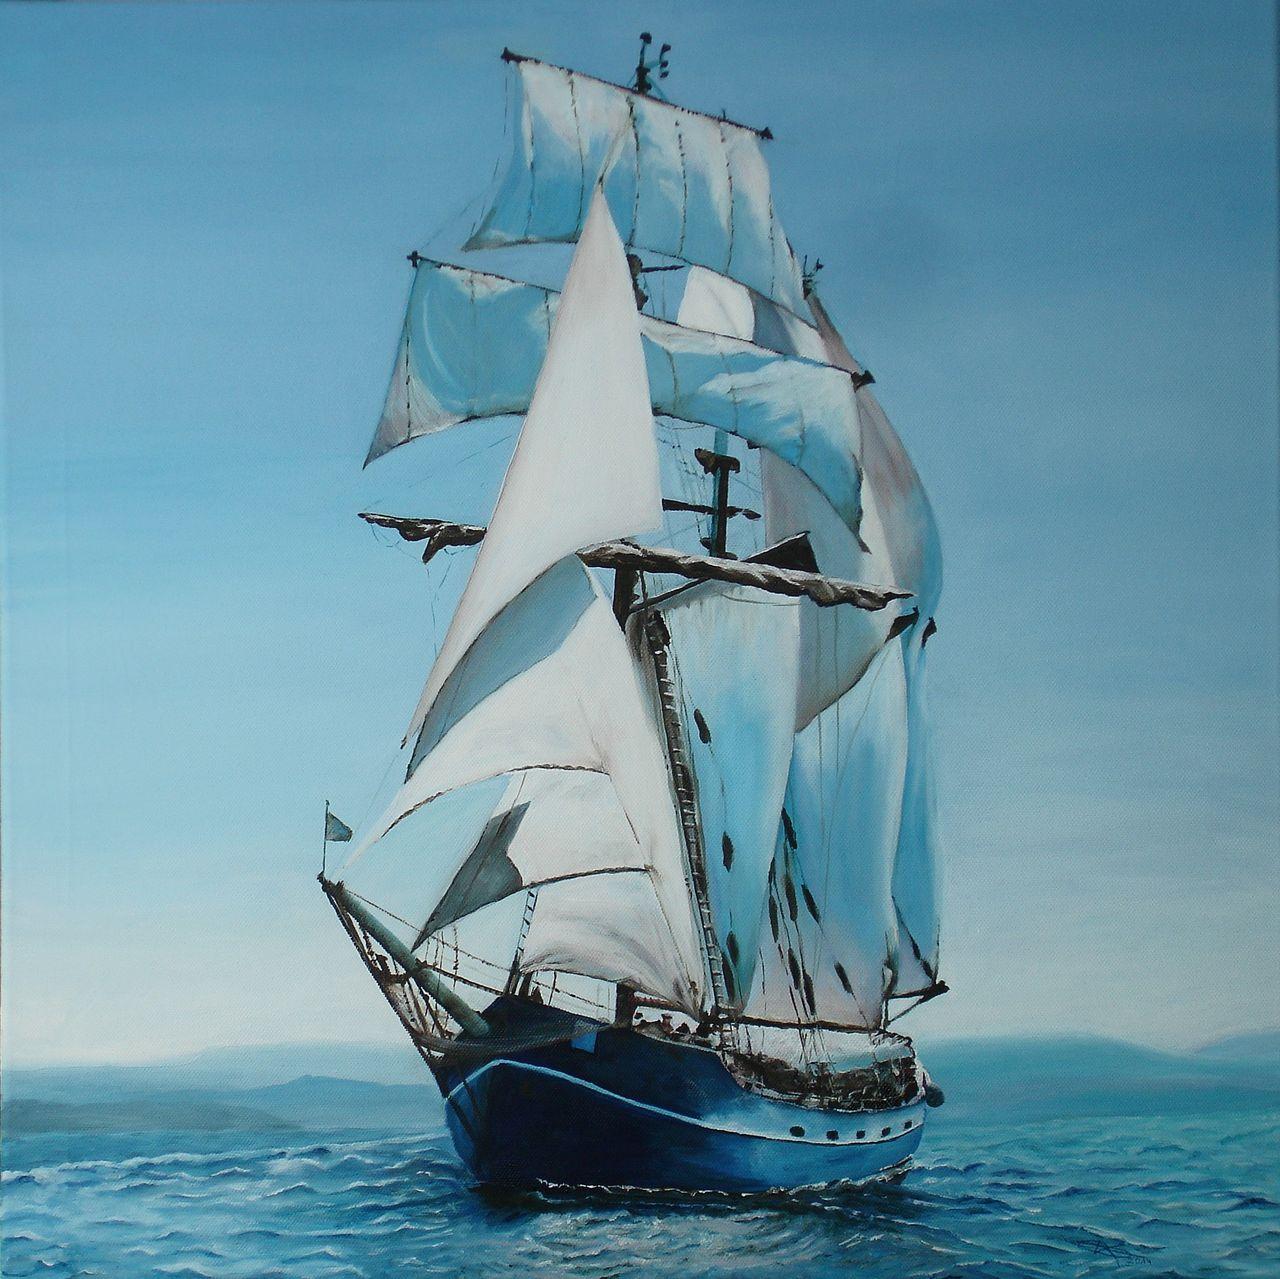 Segelschiffe auf dem meer  Bild: Meer, Segelschiff, Malerei von Keanu Dahinden bei KunstNet